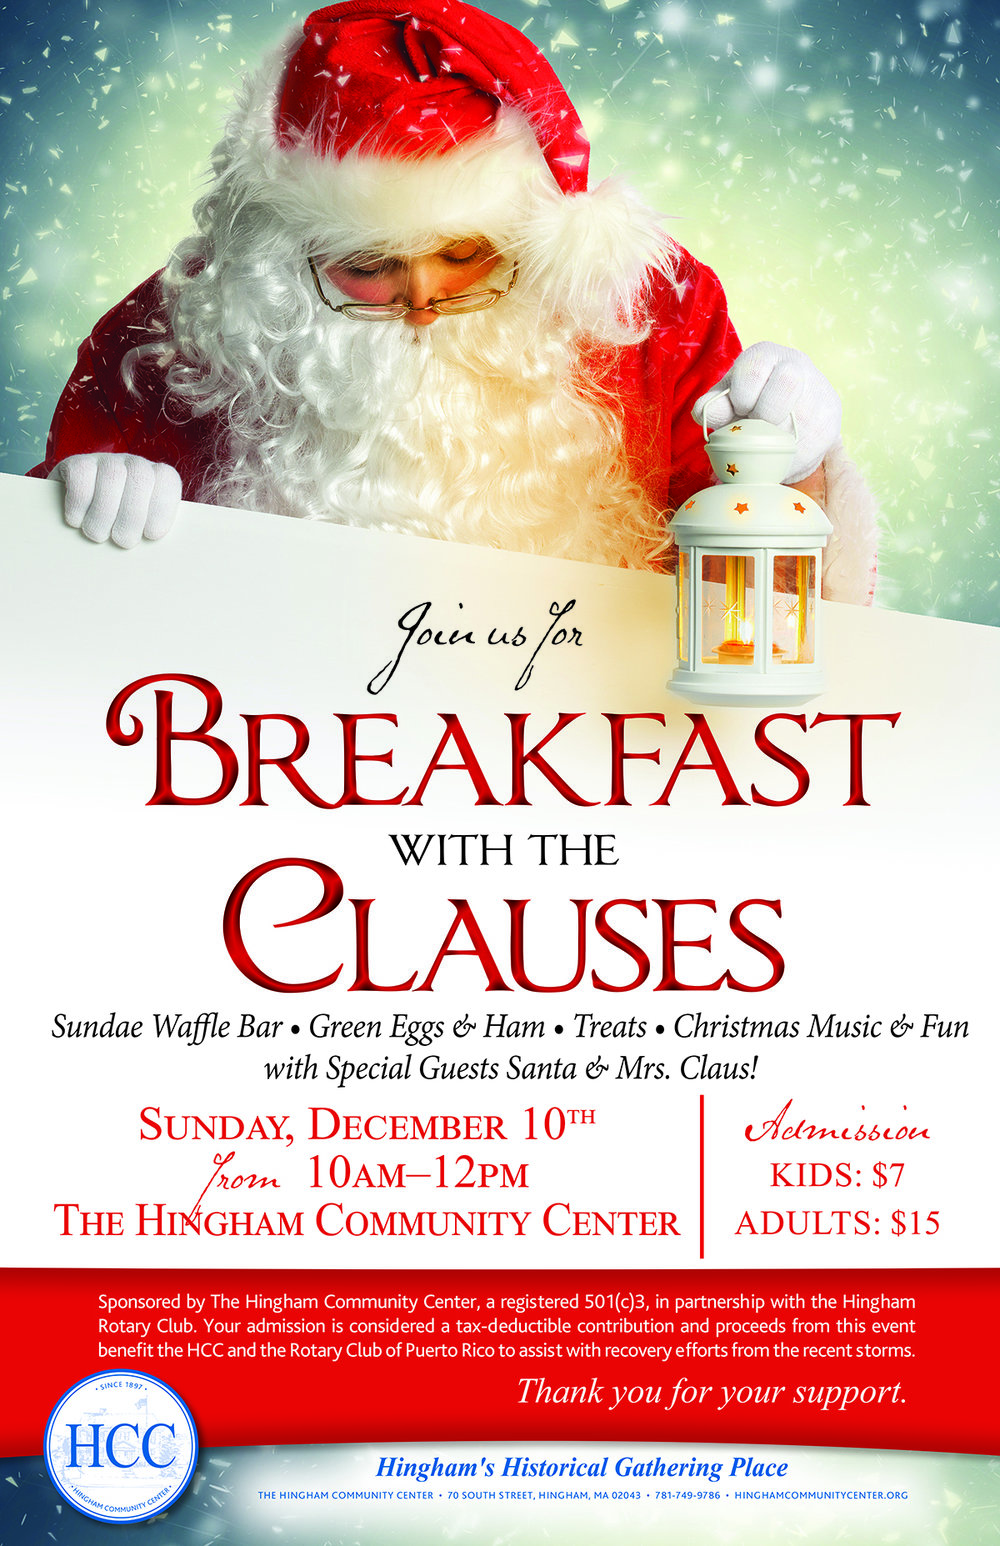 HCC_Breakfast w The Clauses Poster_11x17_dbd_upload.jpg